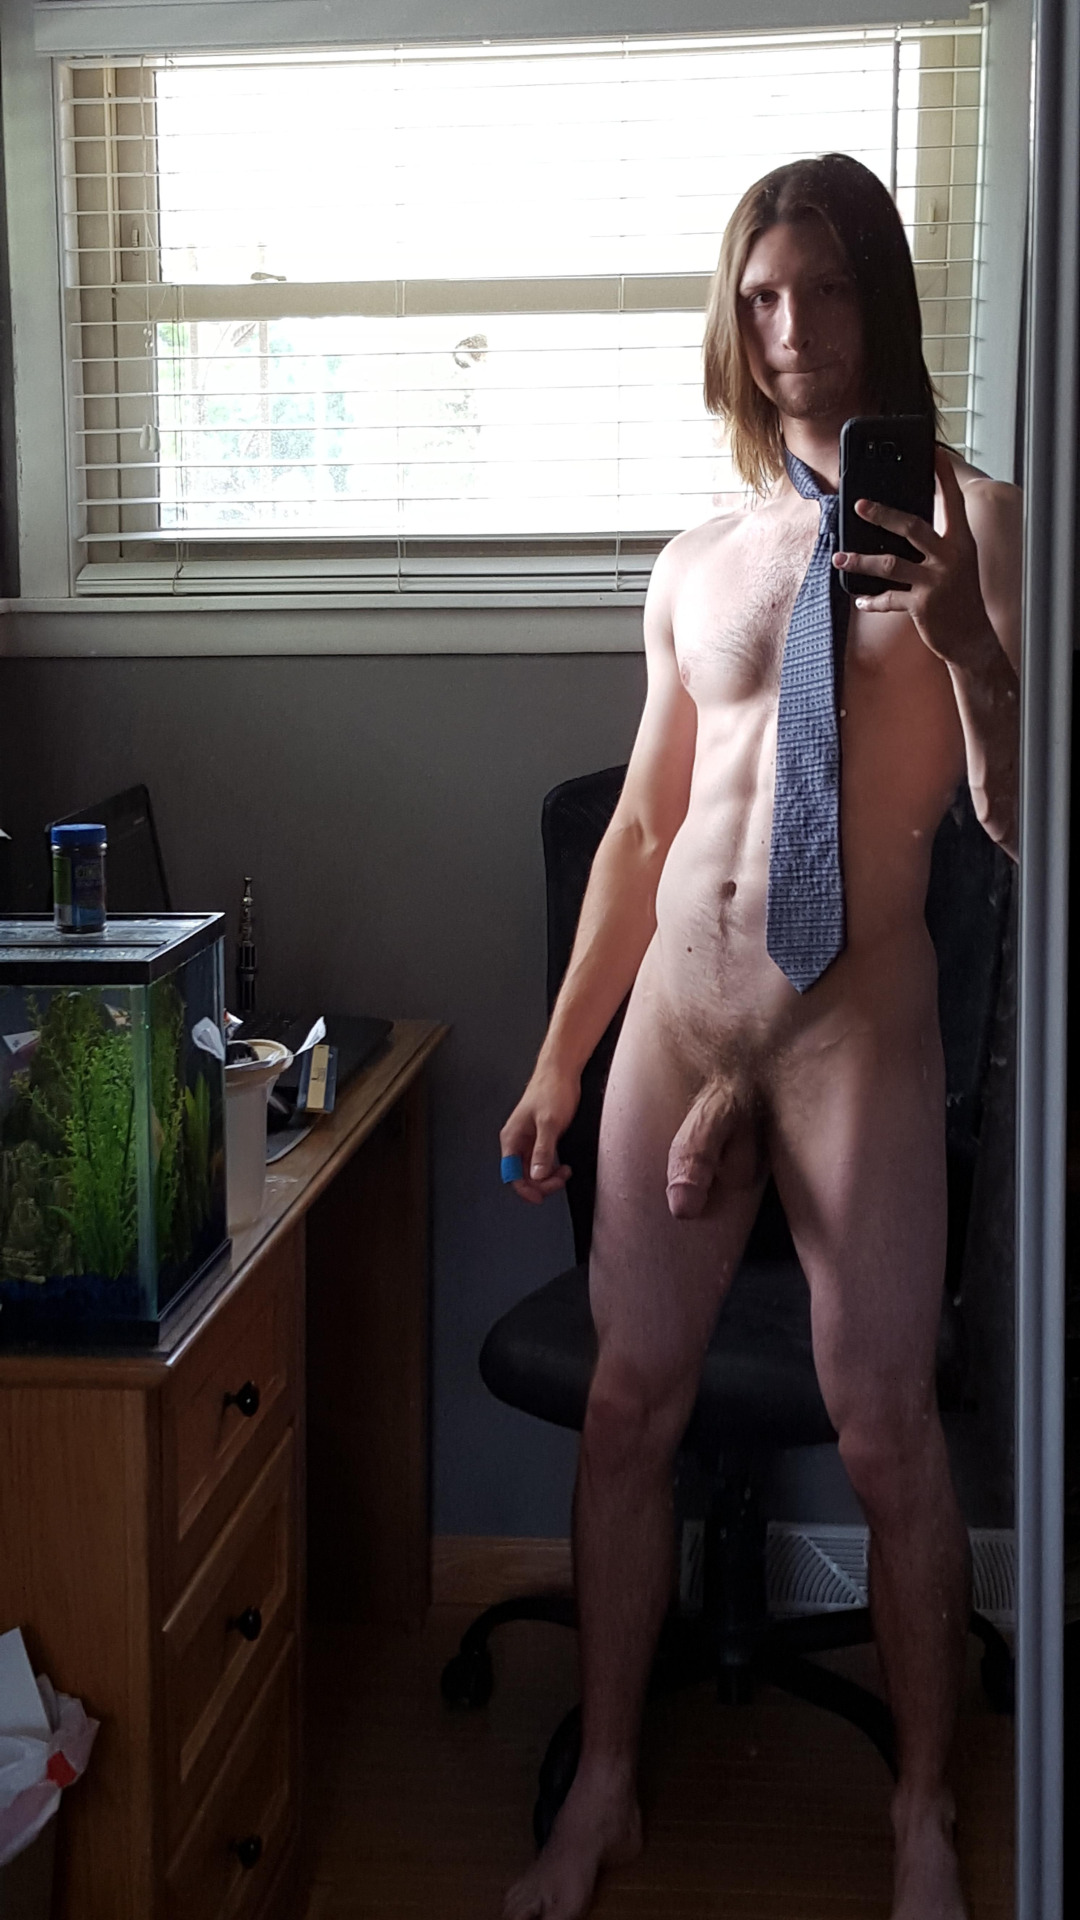 hardon longhair gay